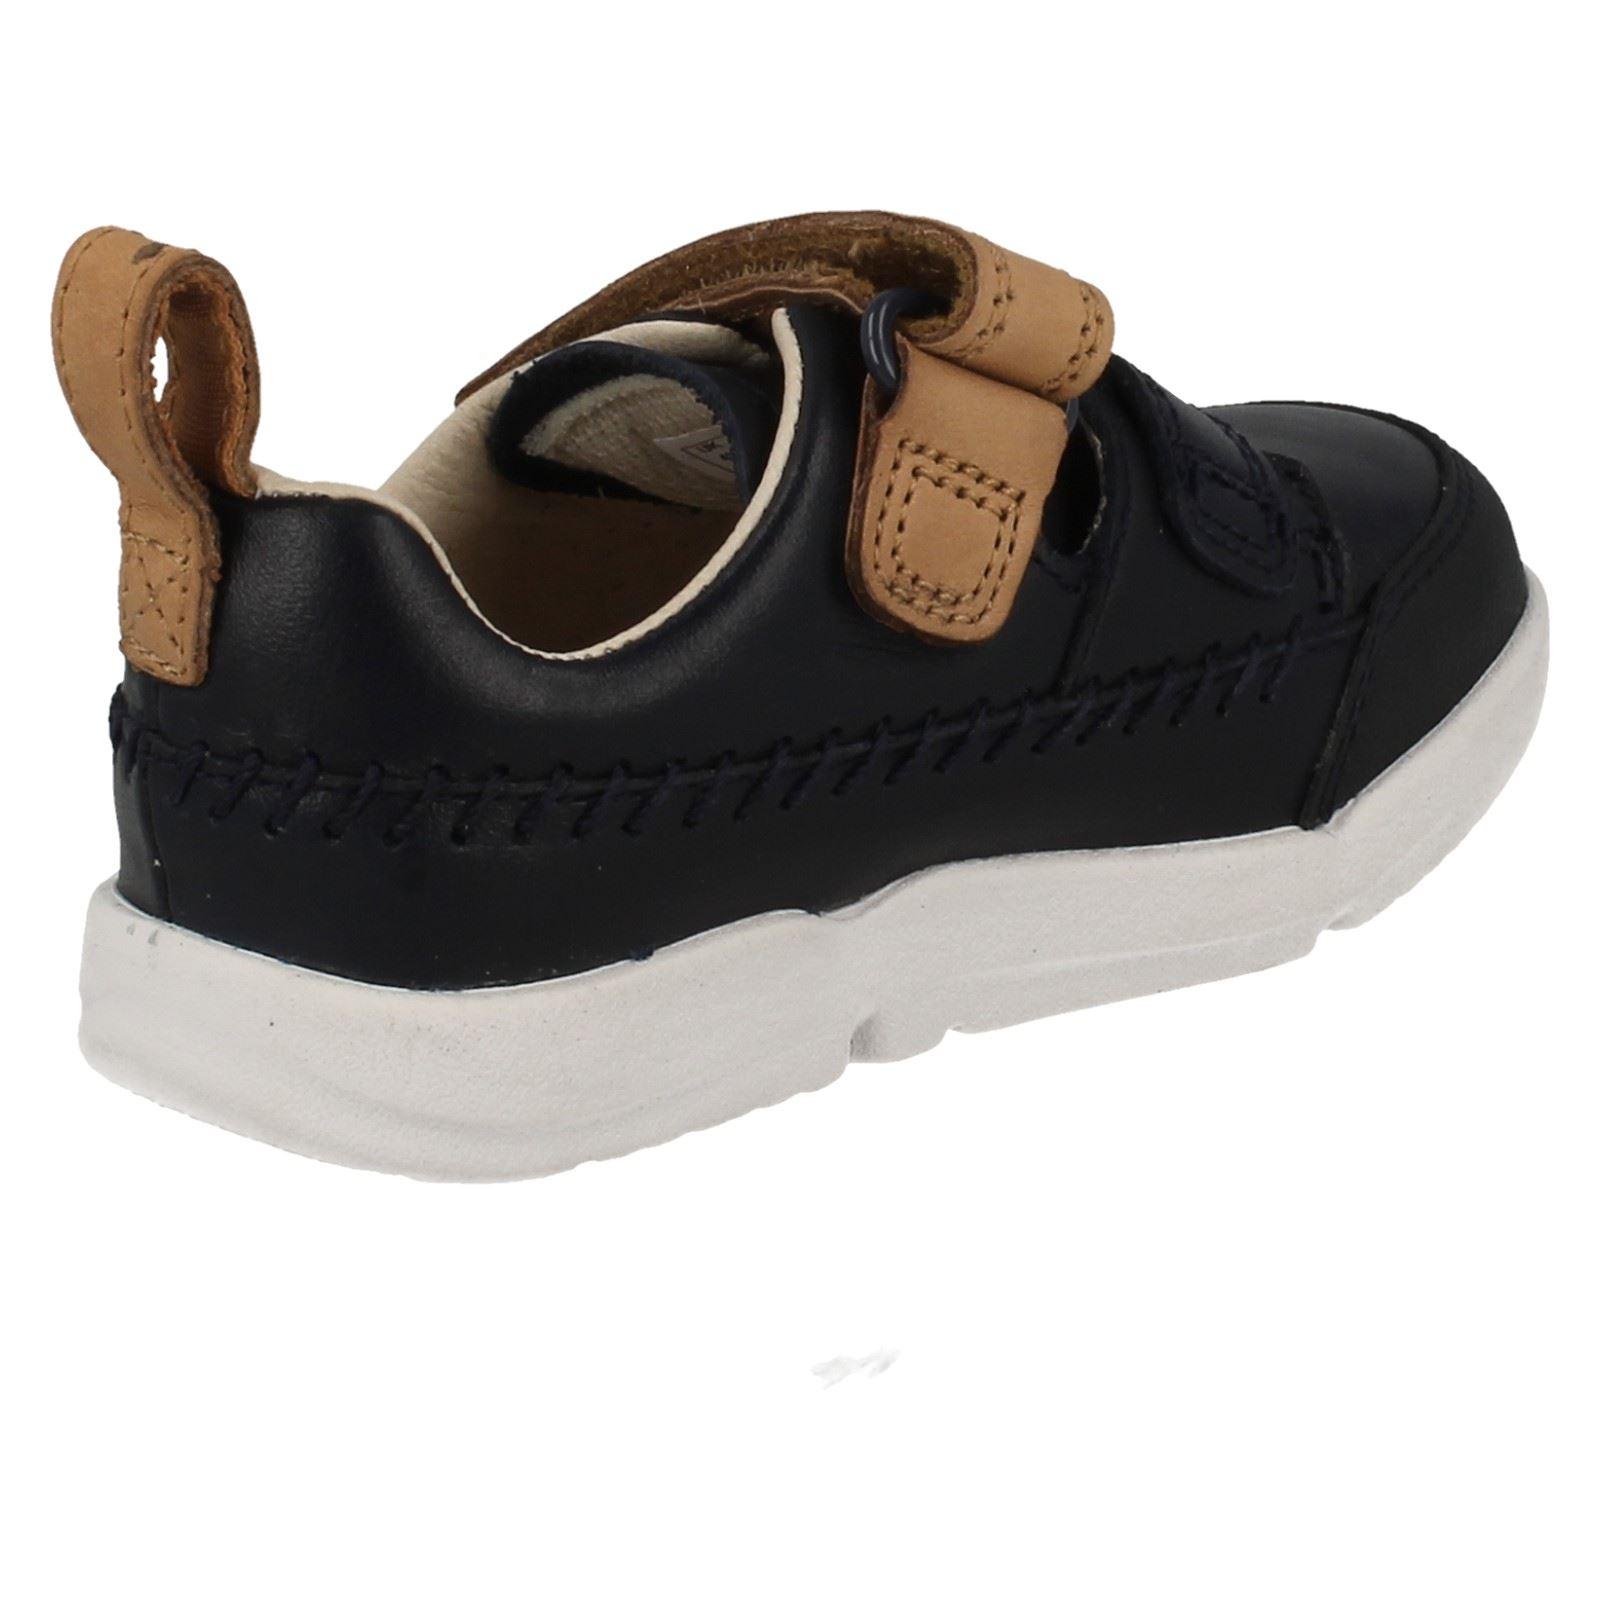 Clarks niños azul Tri caminar Navy para Aspire Primeros para zapatos RqZHXX